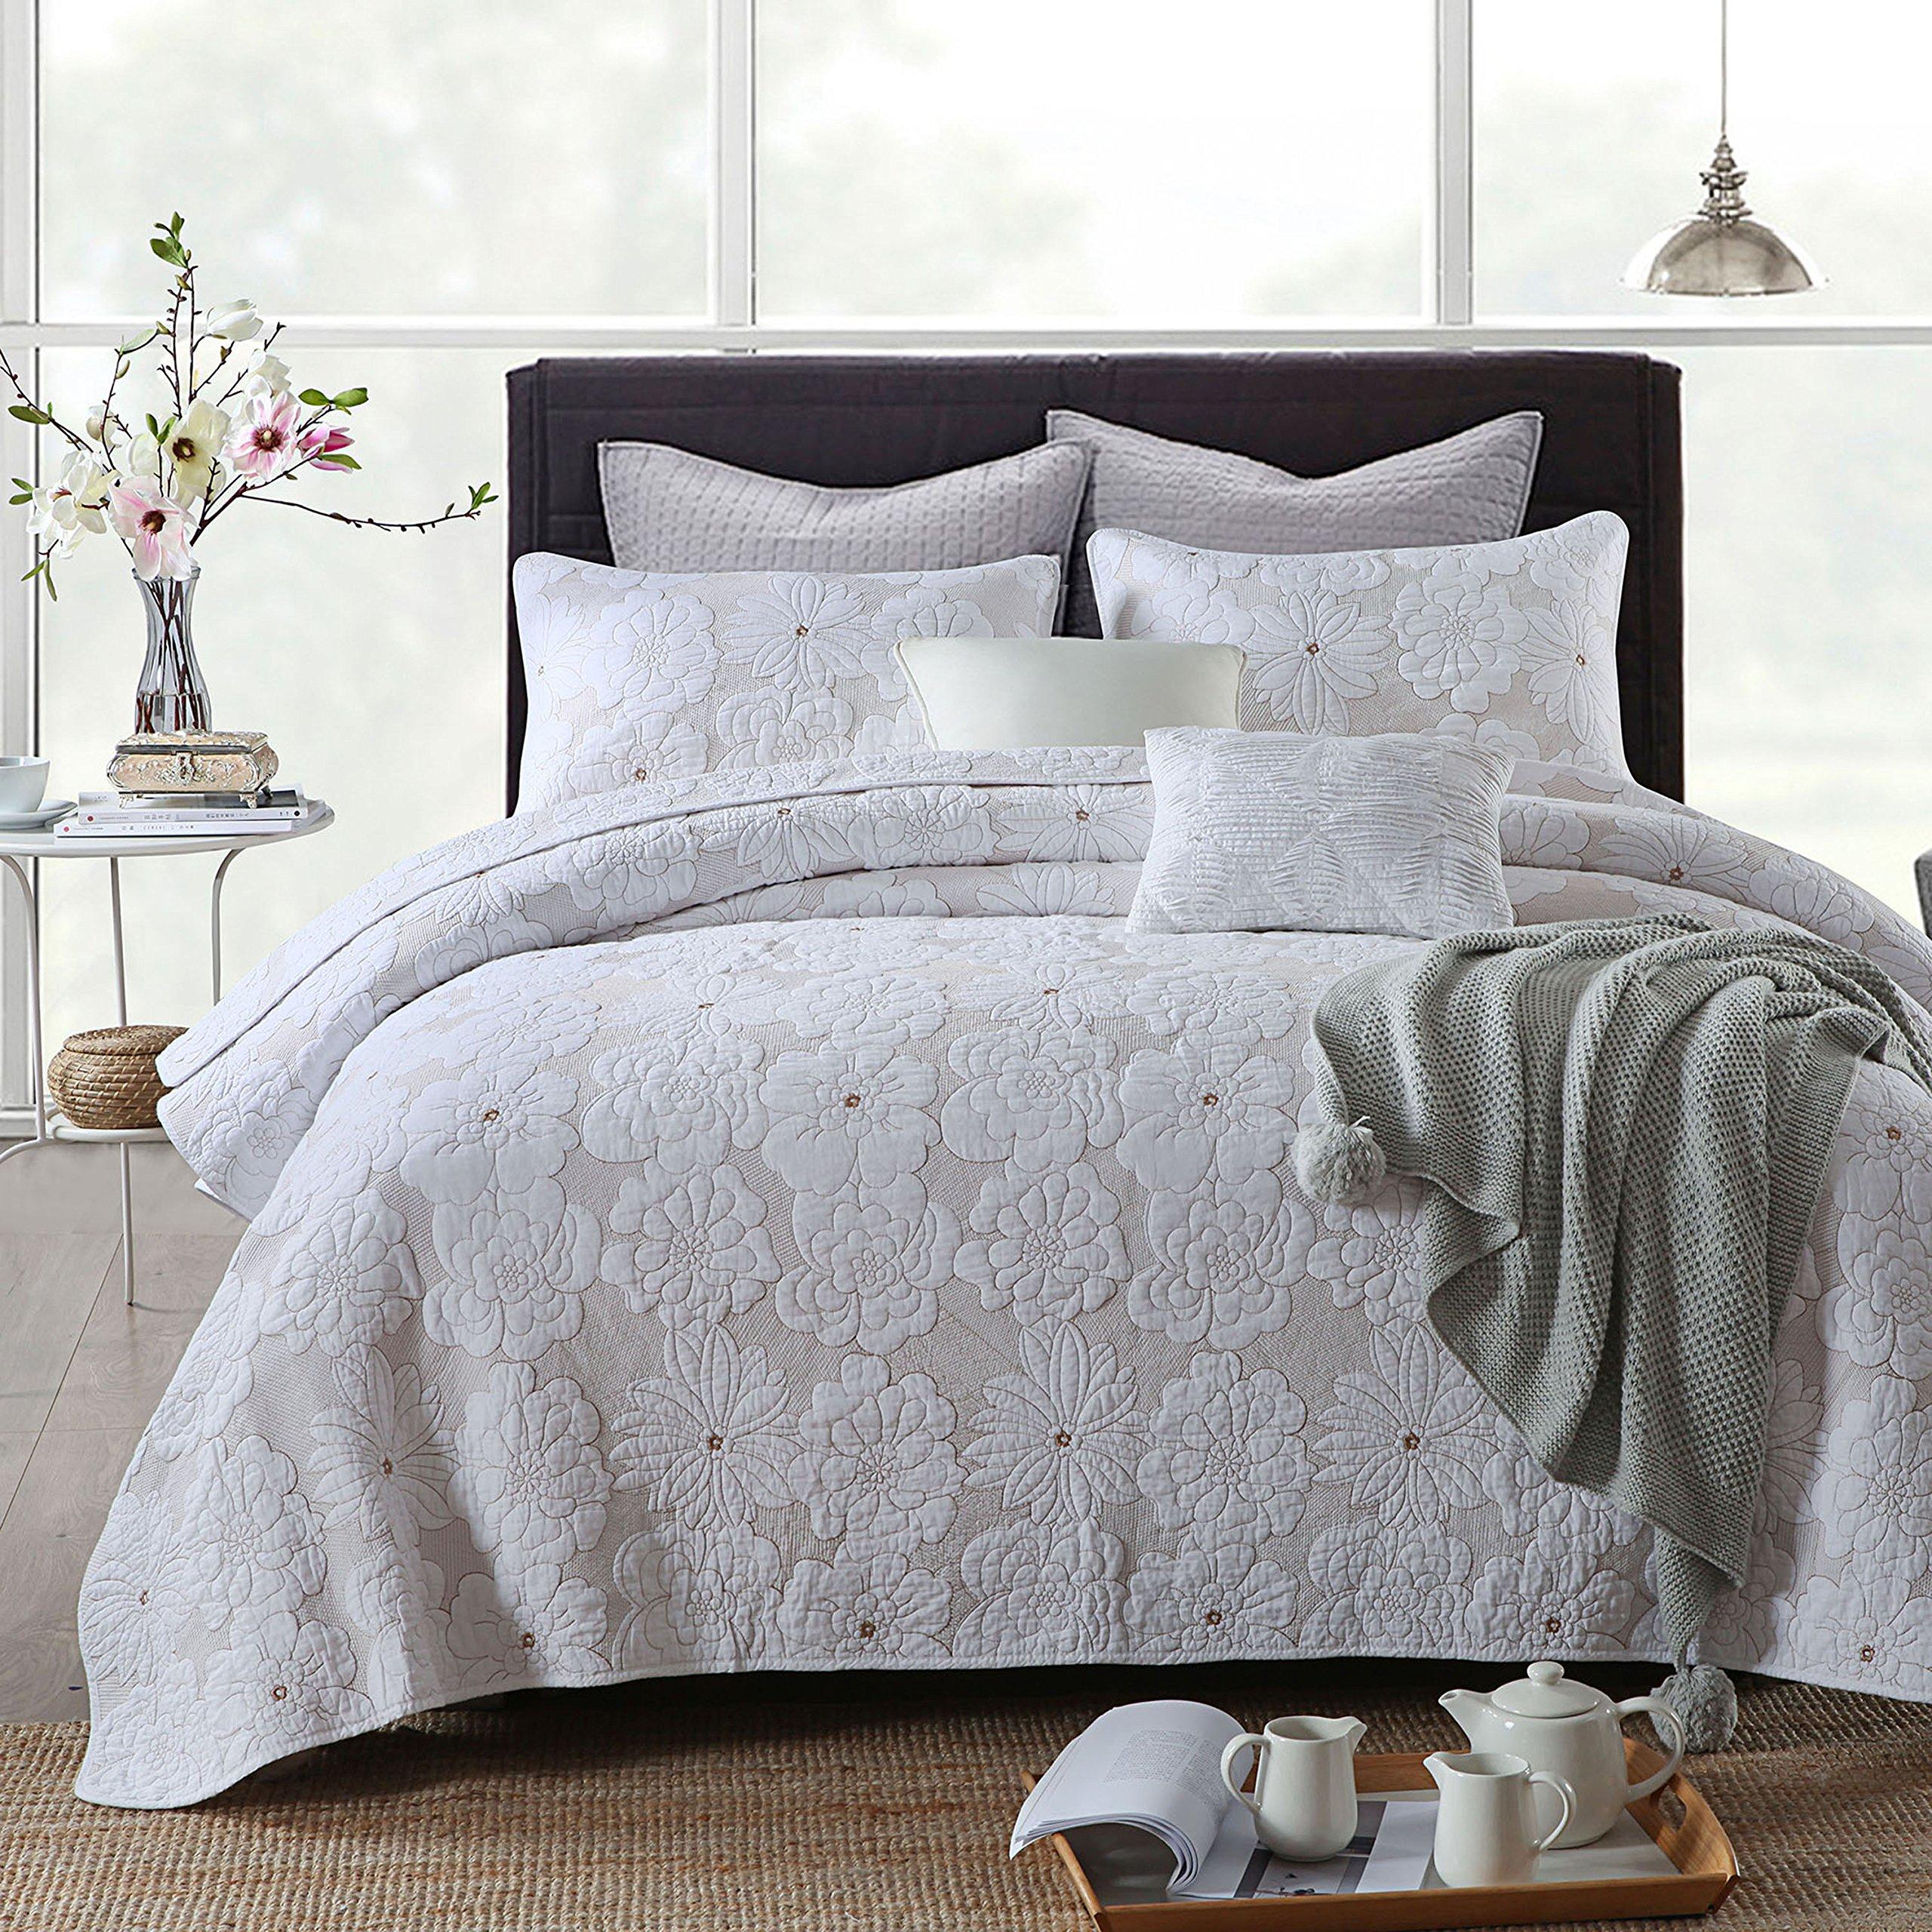 3-Piece Comforter Set, Flower Embroidery Quilt Set, Bedspread Set, White (King)